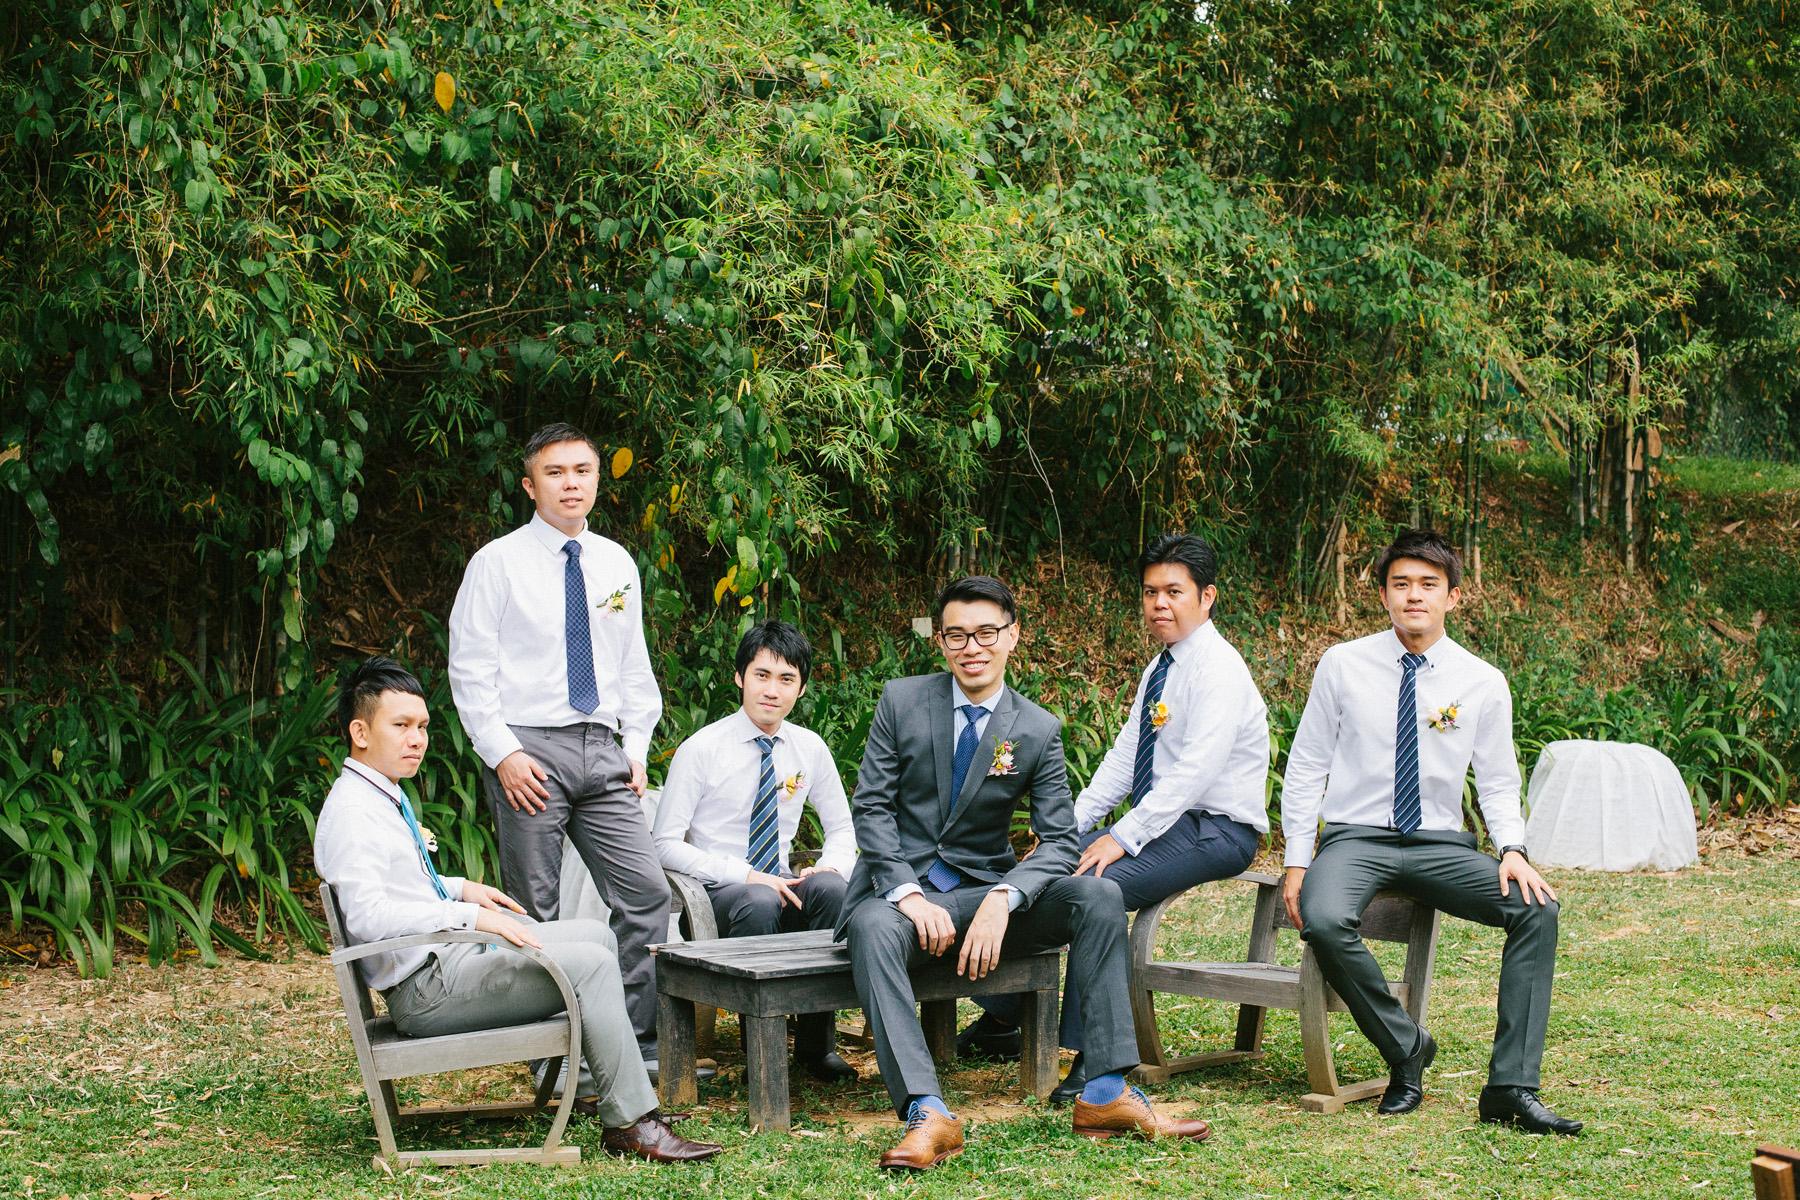 singapore-wedding-travel-photographer-faith-alvin-wedding-wmt-29.jpg